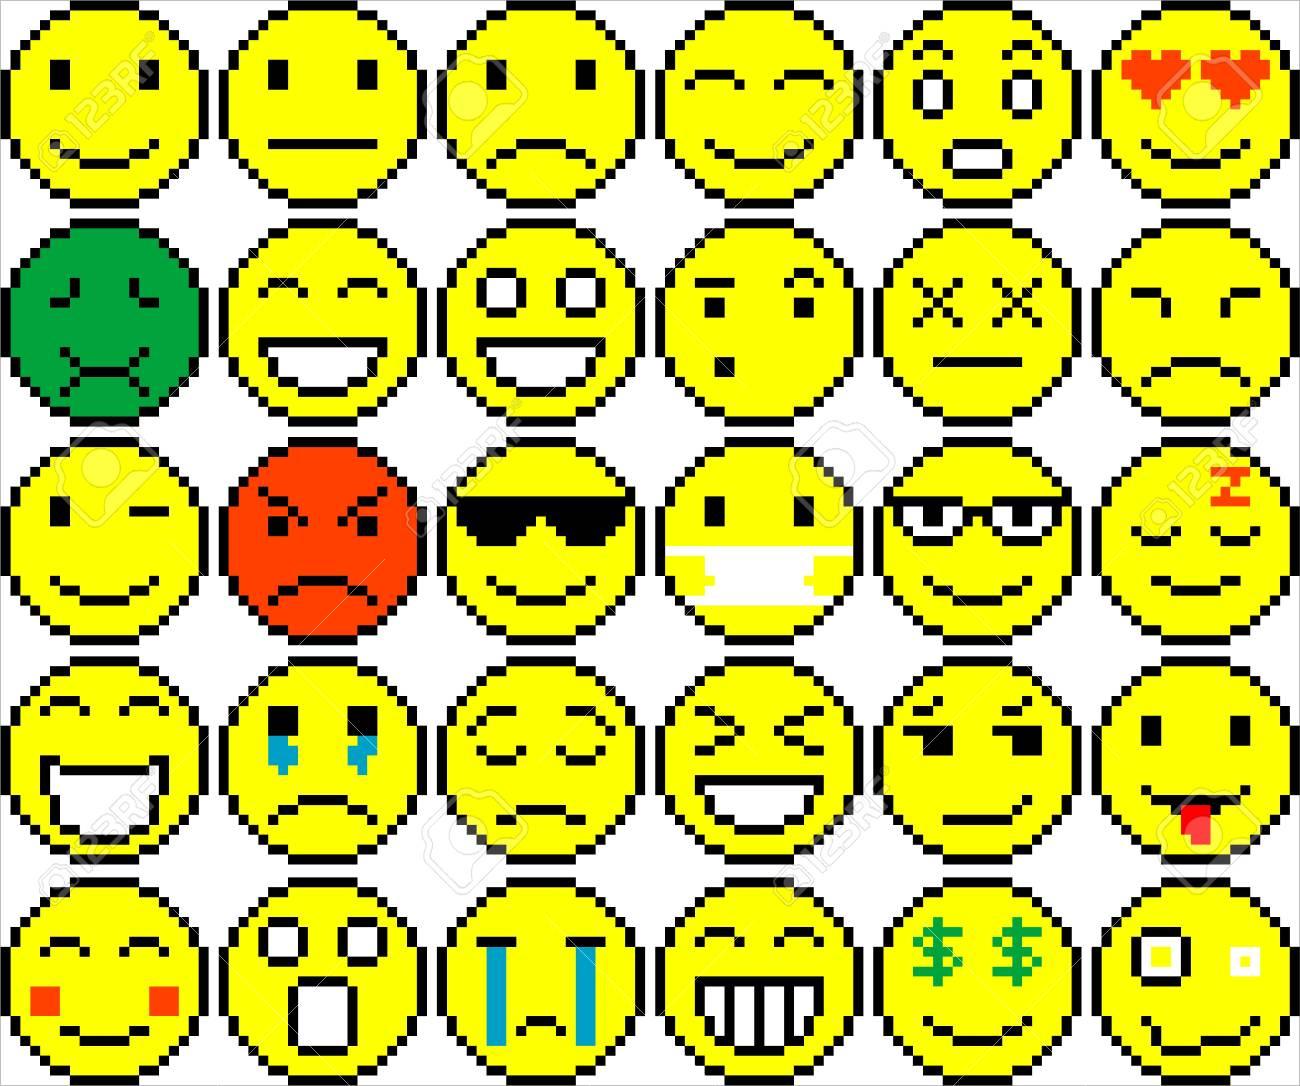 Set Of Black And White Pixel Art Emoticons